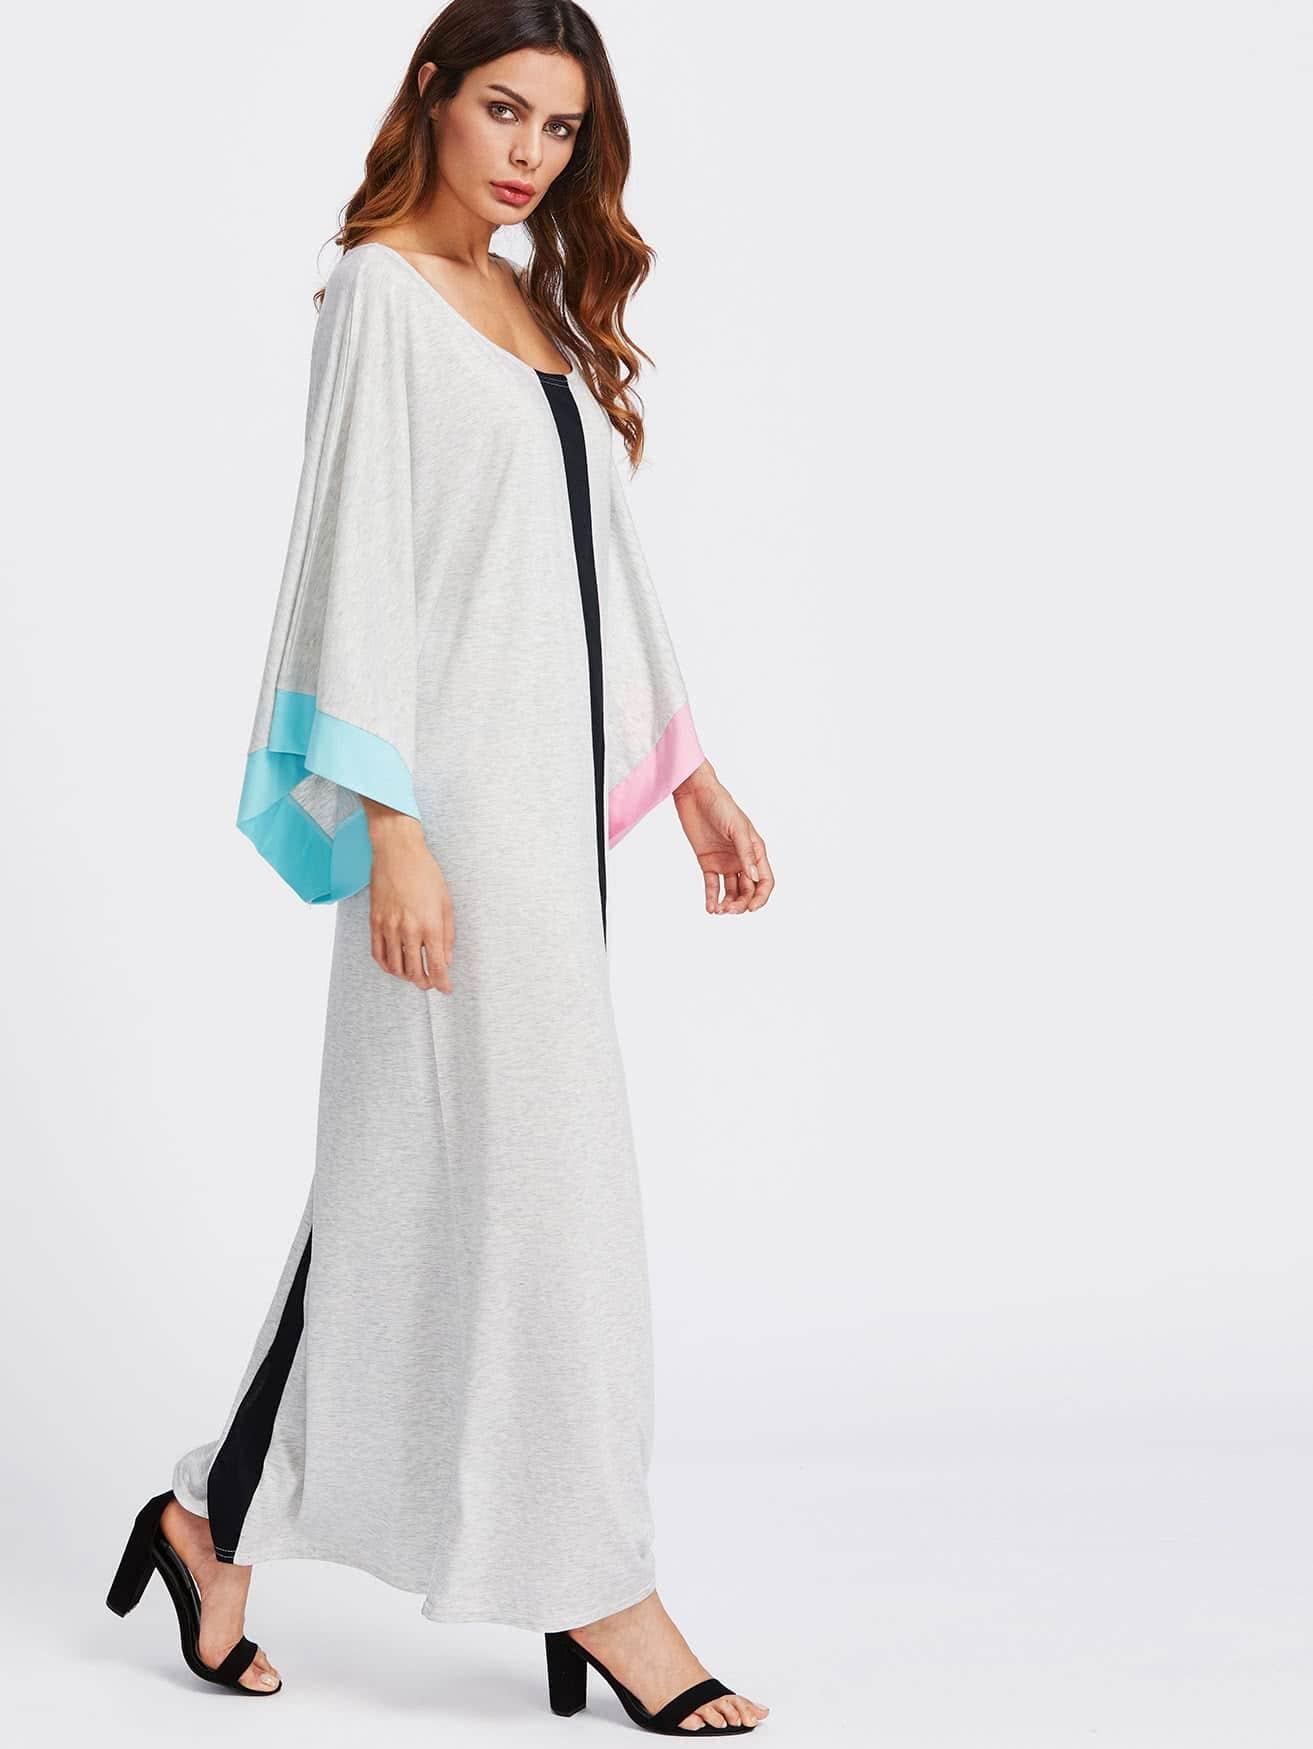 Contrast Panel Kimono Sleeve Full Length Dress